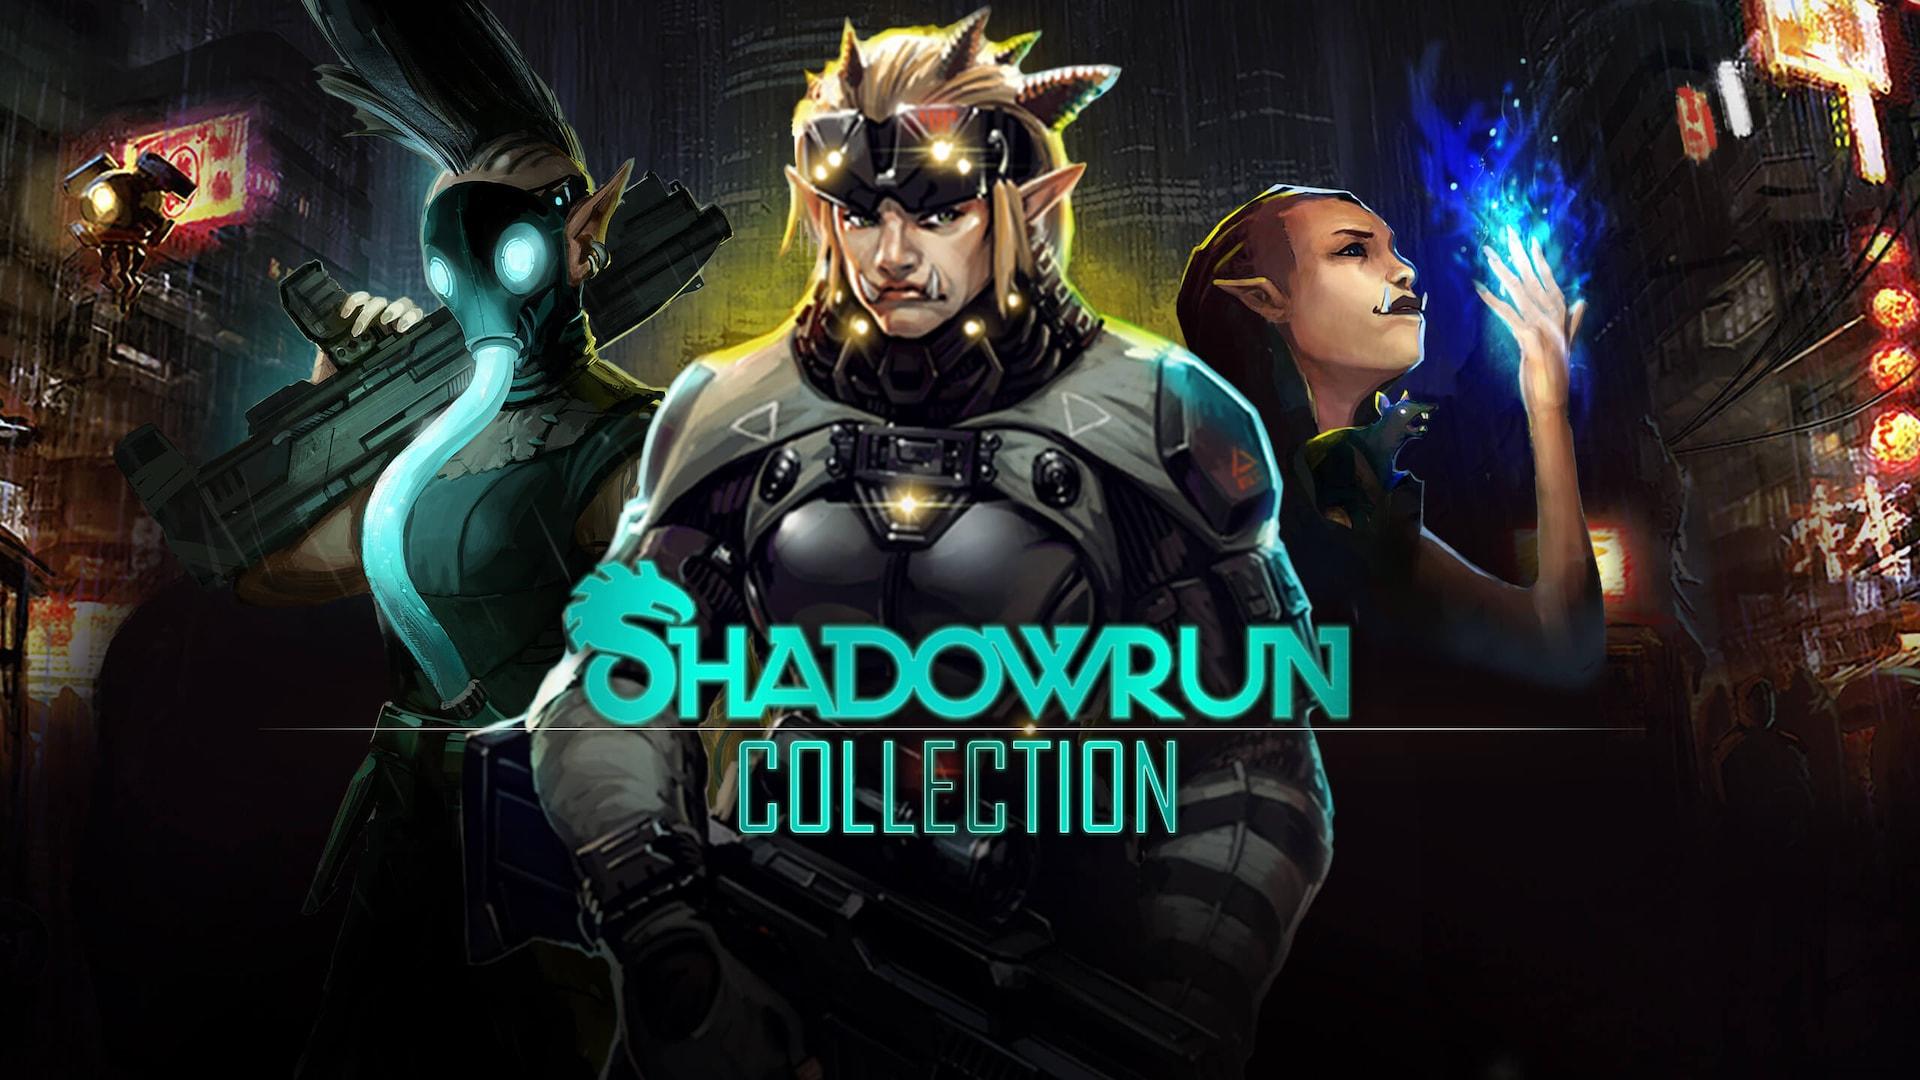 shadowrun-collection - Shadowrun Collection